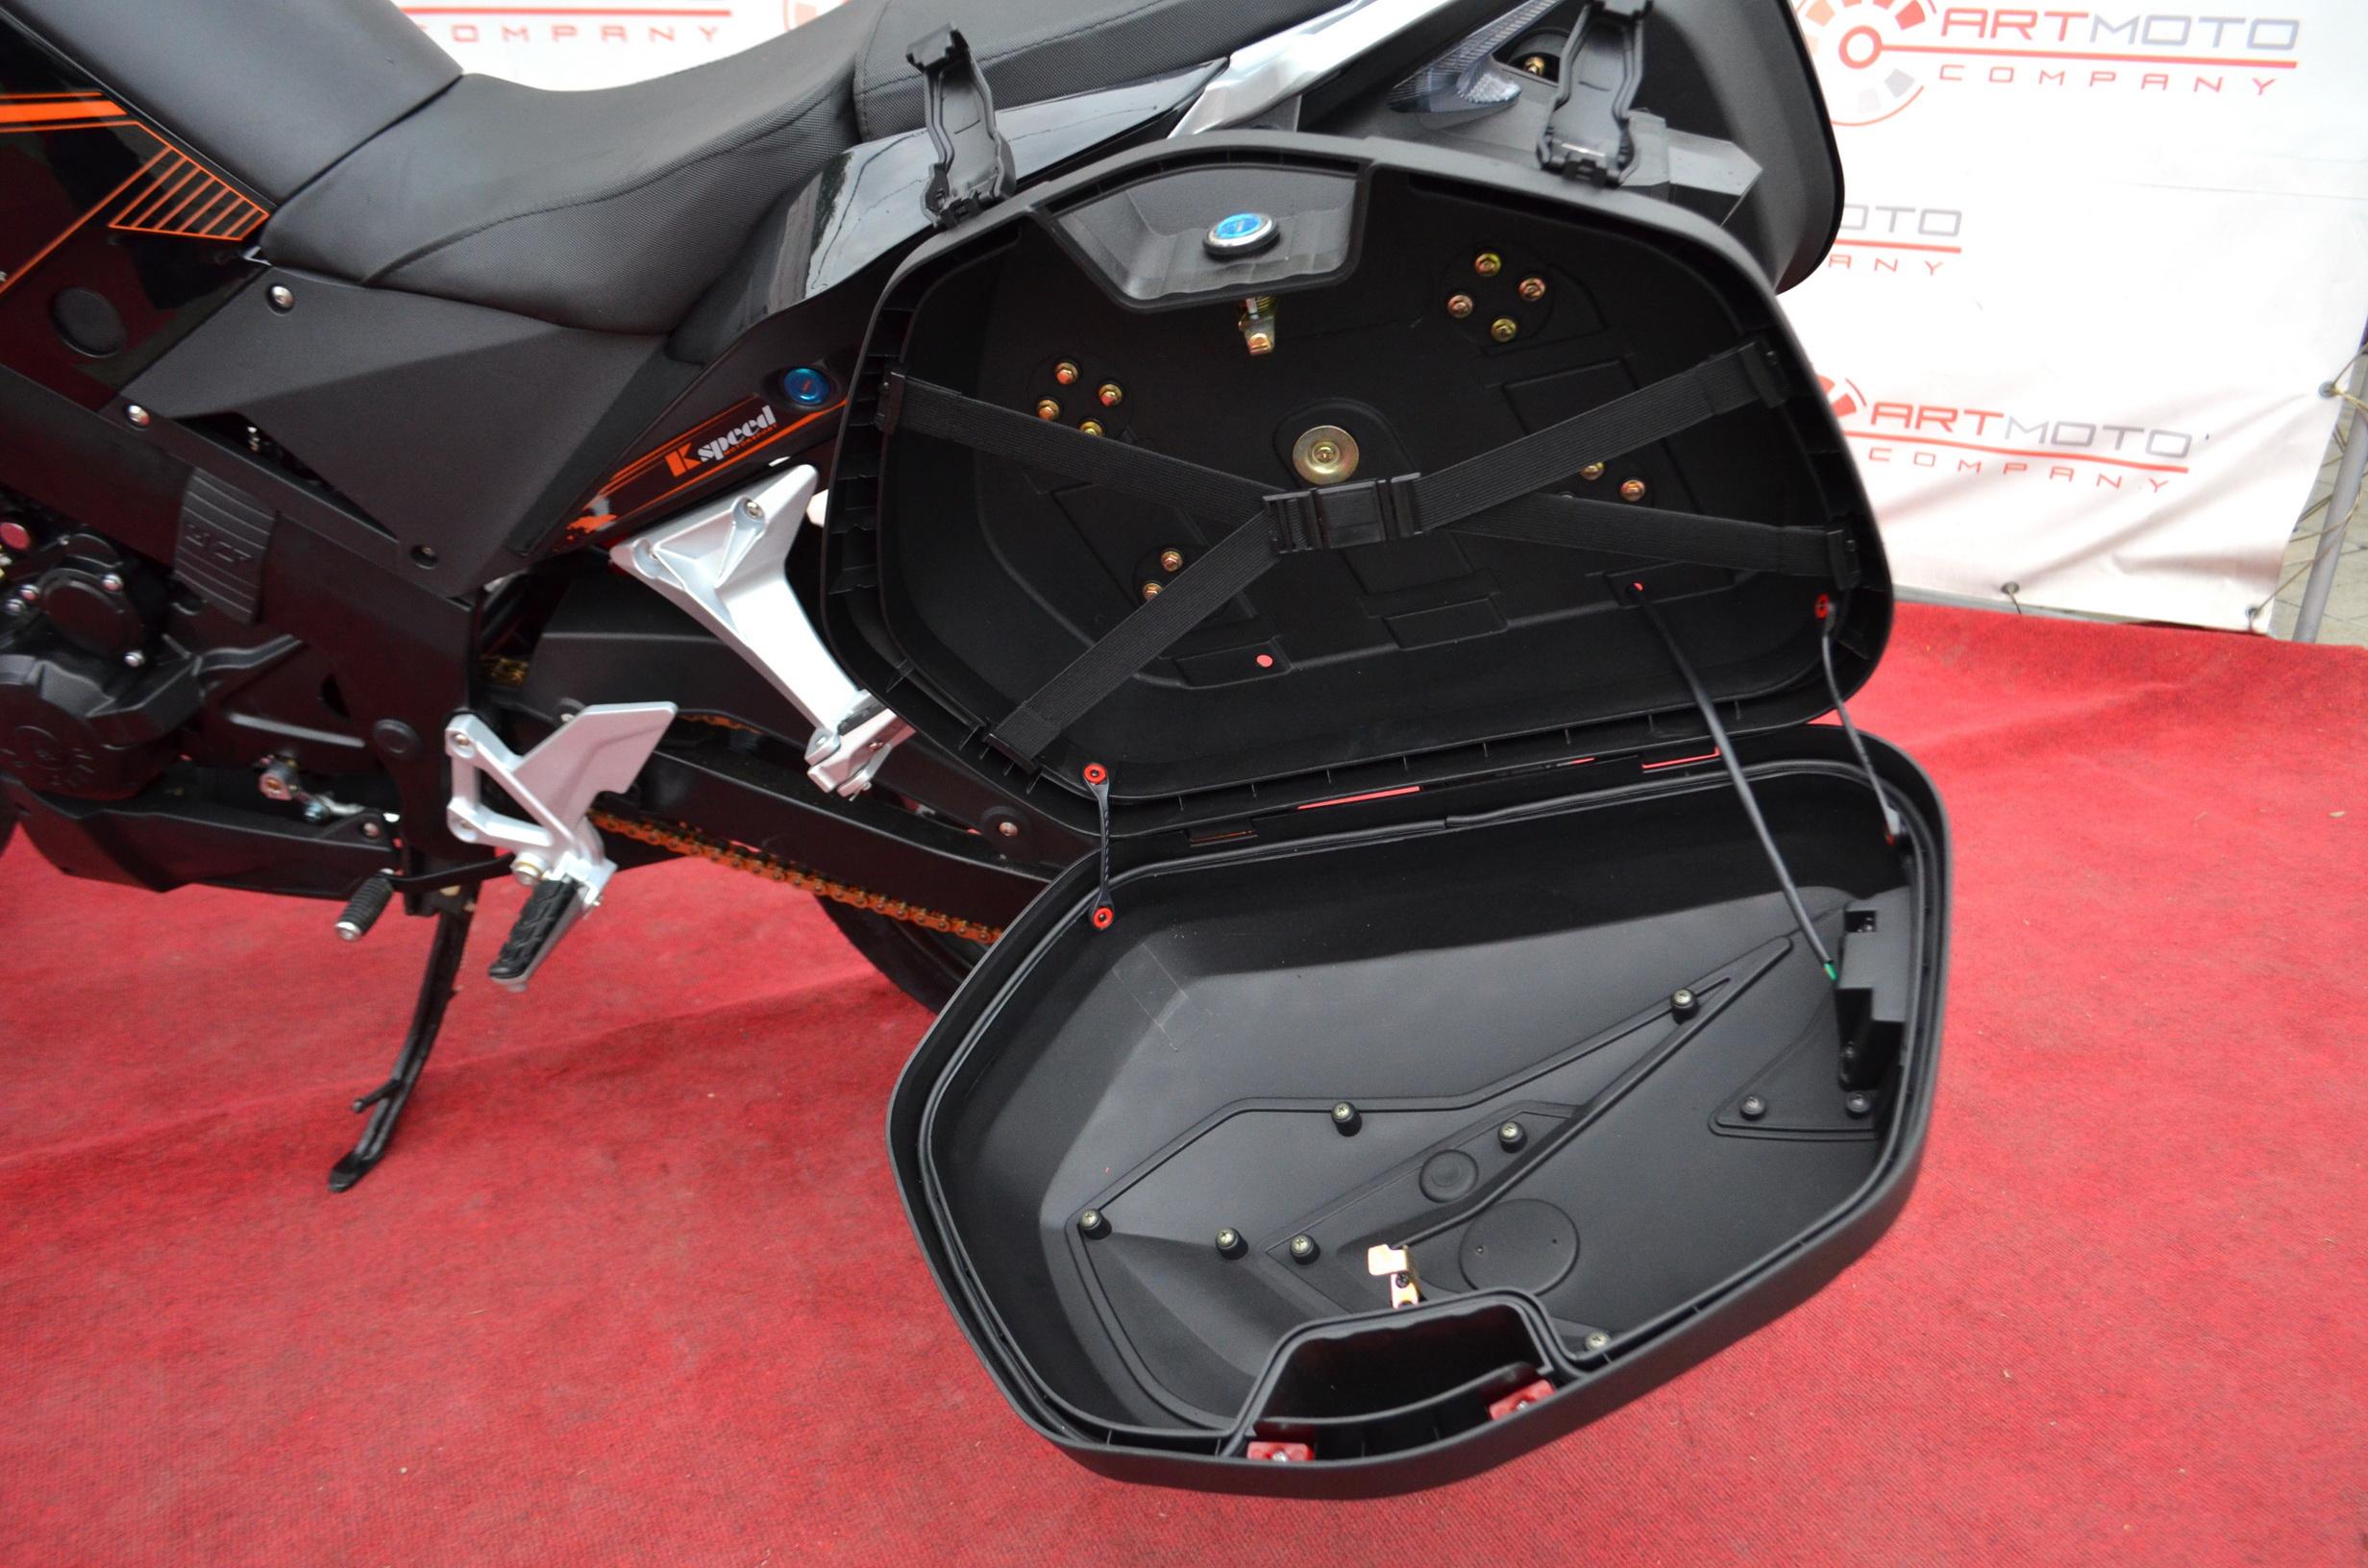 МОТОЦИКЛ BASHAN PSB 250 Green ― Артмото - купить квадроцикл в украине и харькове, мотоцикл, снегоход, скутер, мопед, электромобиль